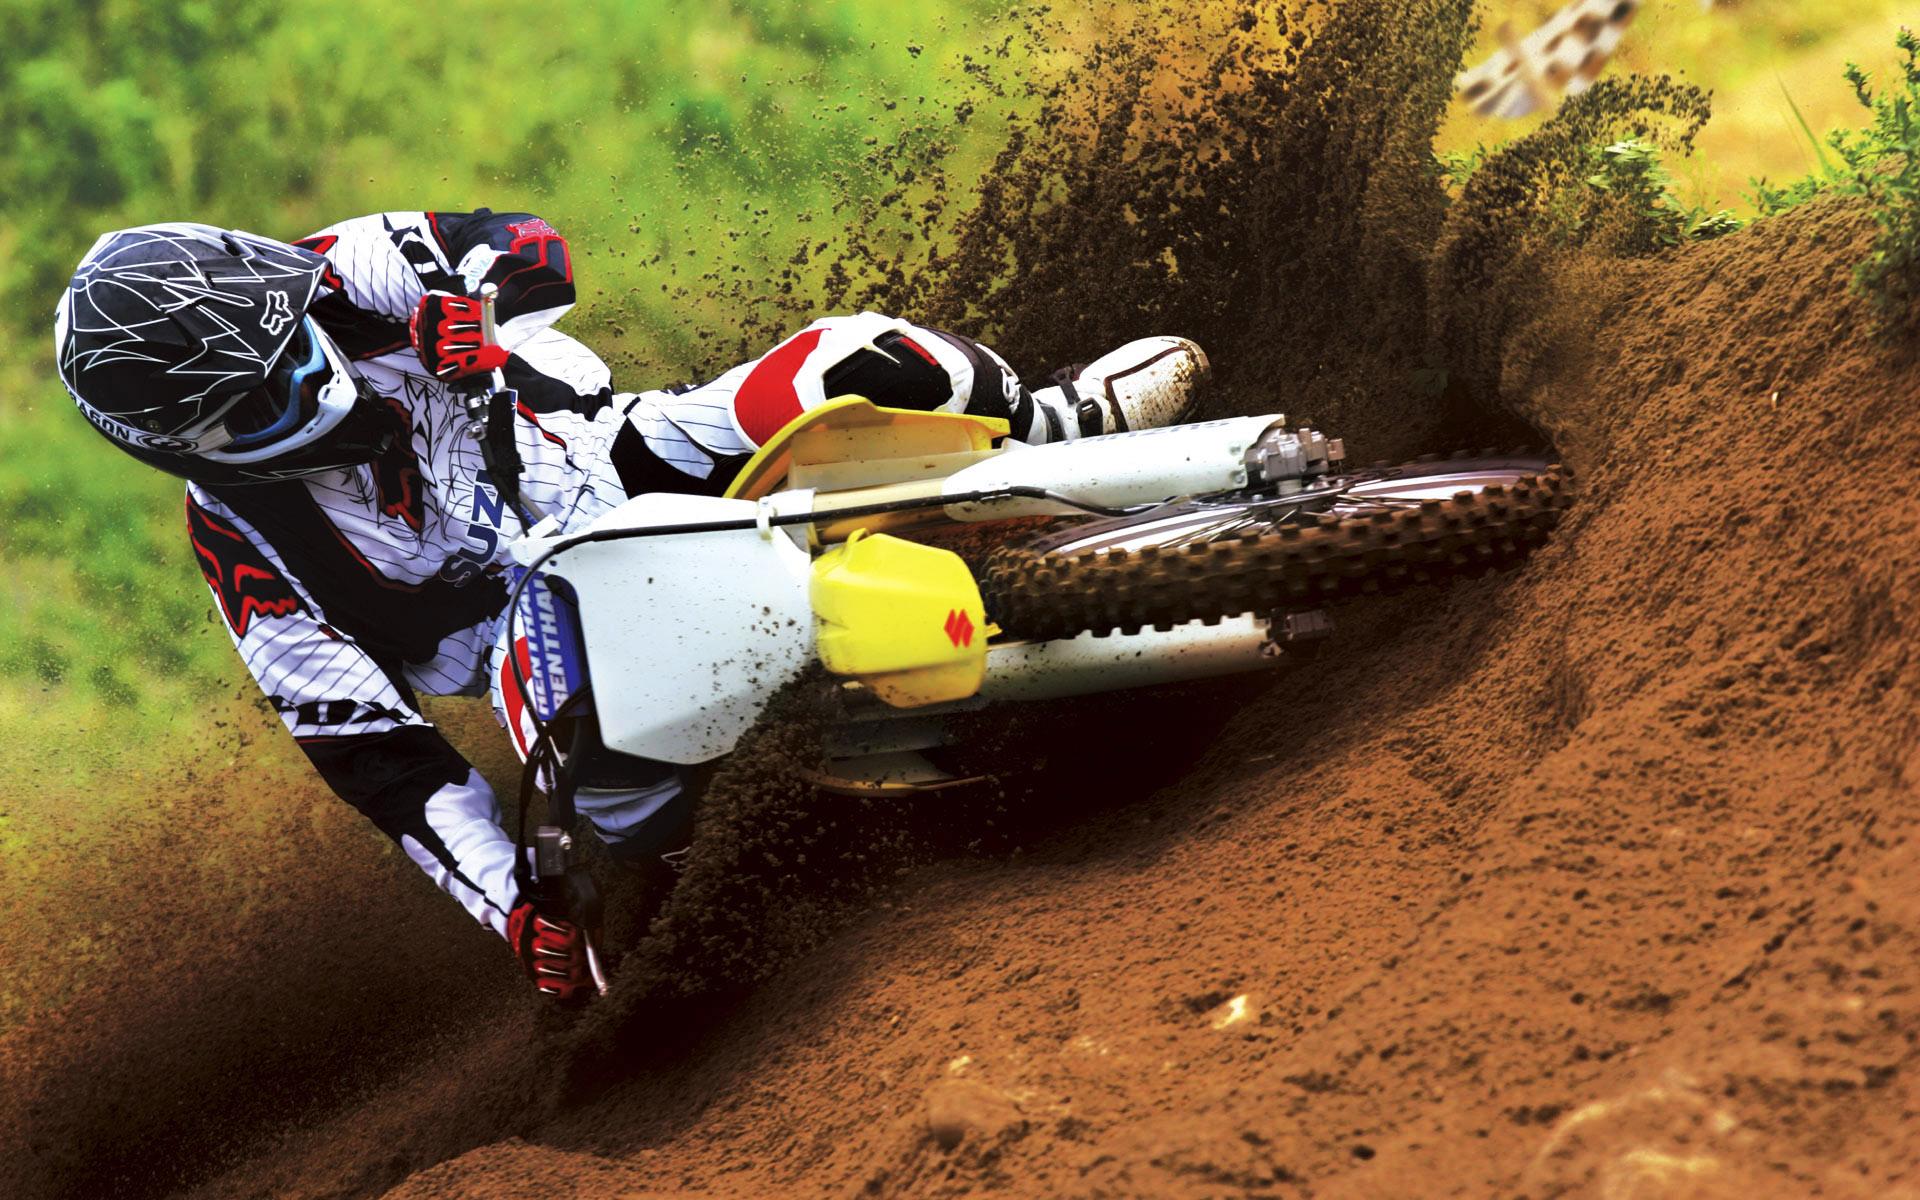 Suzuki Motocross Bike Race Wallpapers HD Wallpapers 1920x1200